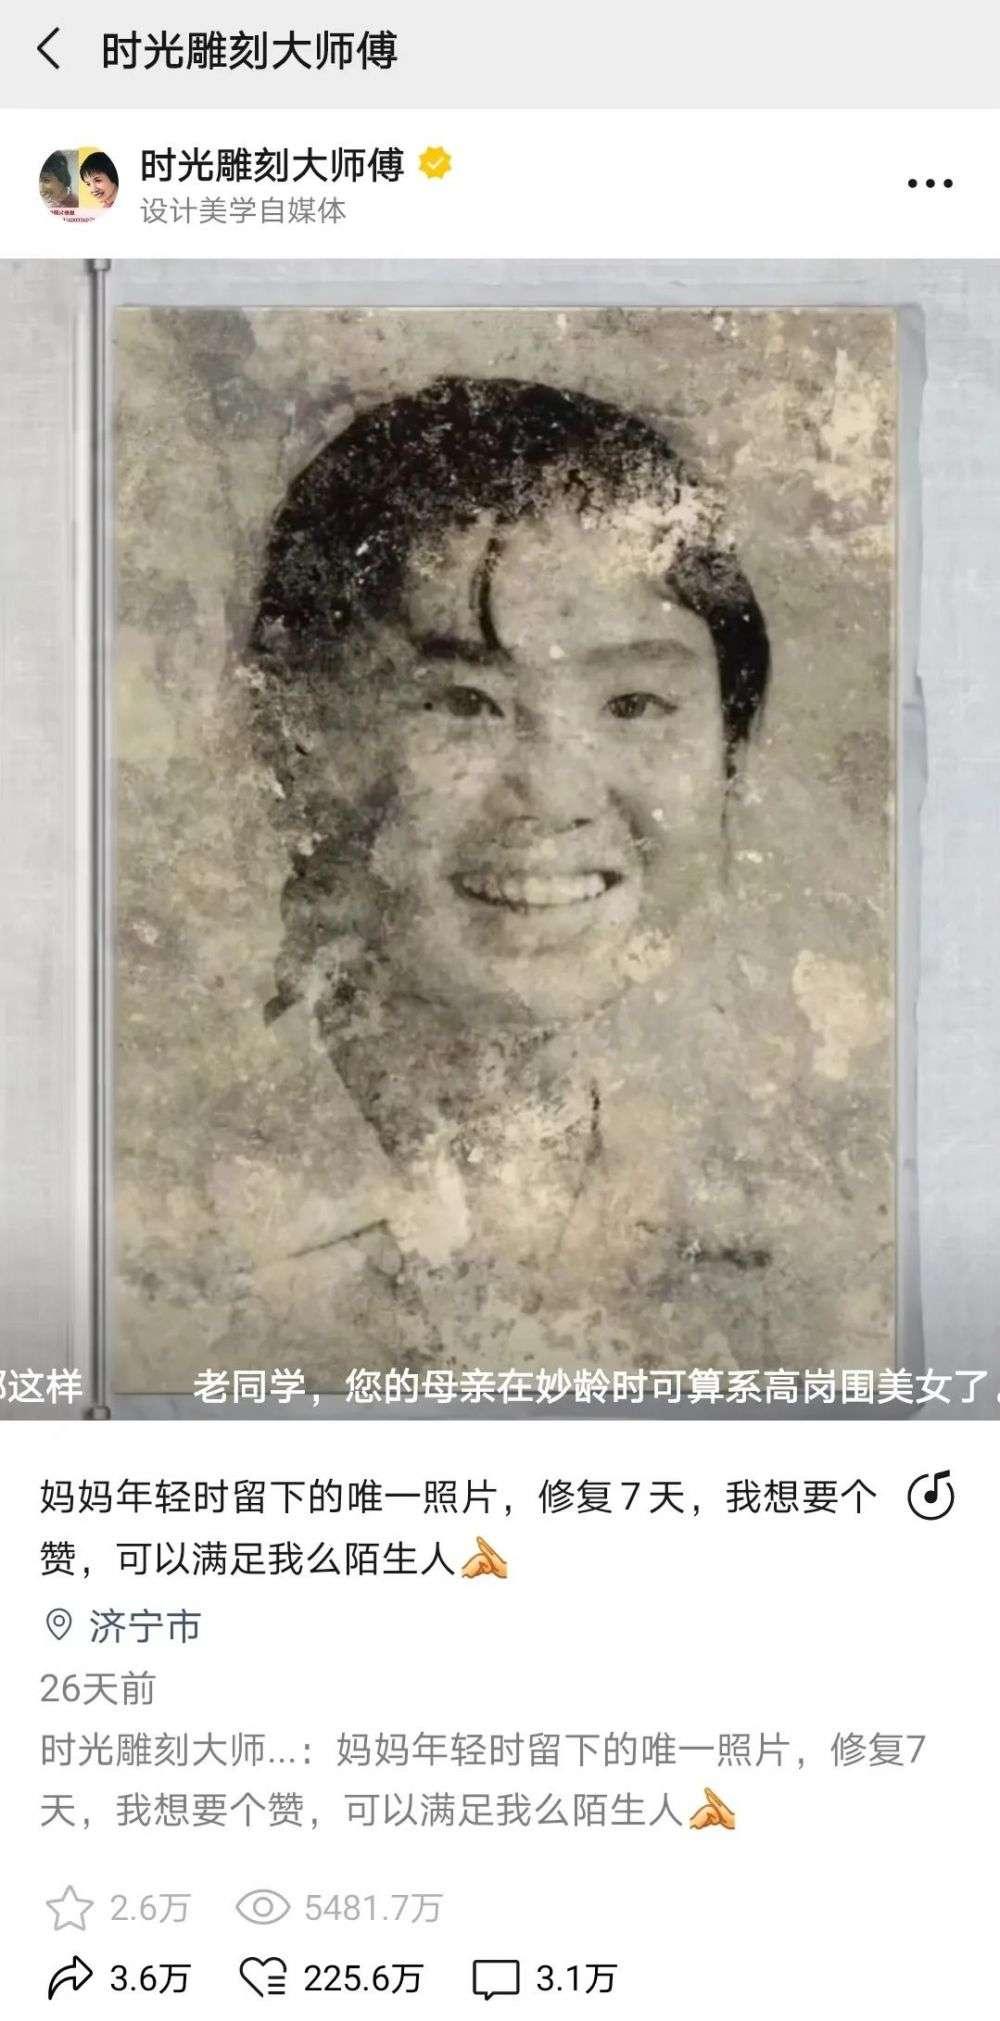 <a href='https://www.zhouxiaohui.cn'><a href='https://www.zhouxiaohui.cn/duanshipin/'>视频号</a></a>连续重磅更新!微信加码赋能,专业玩家将跑步入场?-第5张图片-周小辉博客